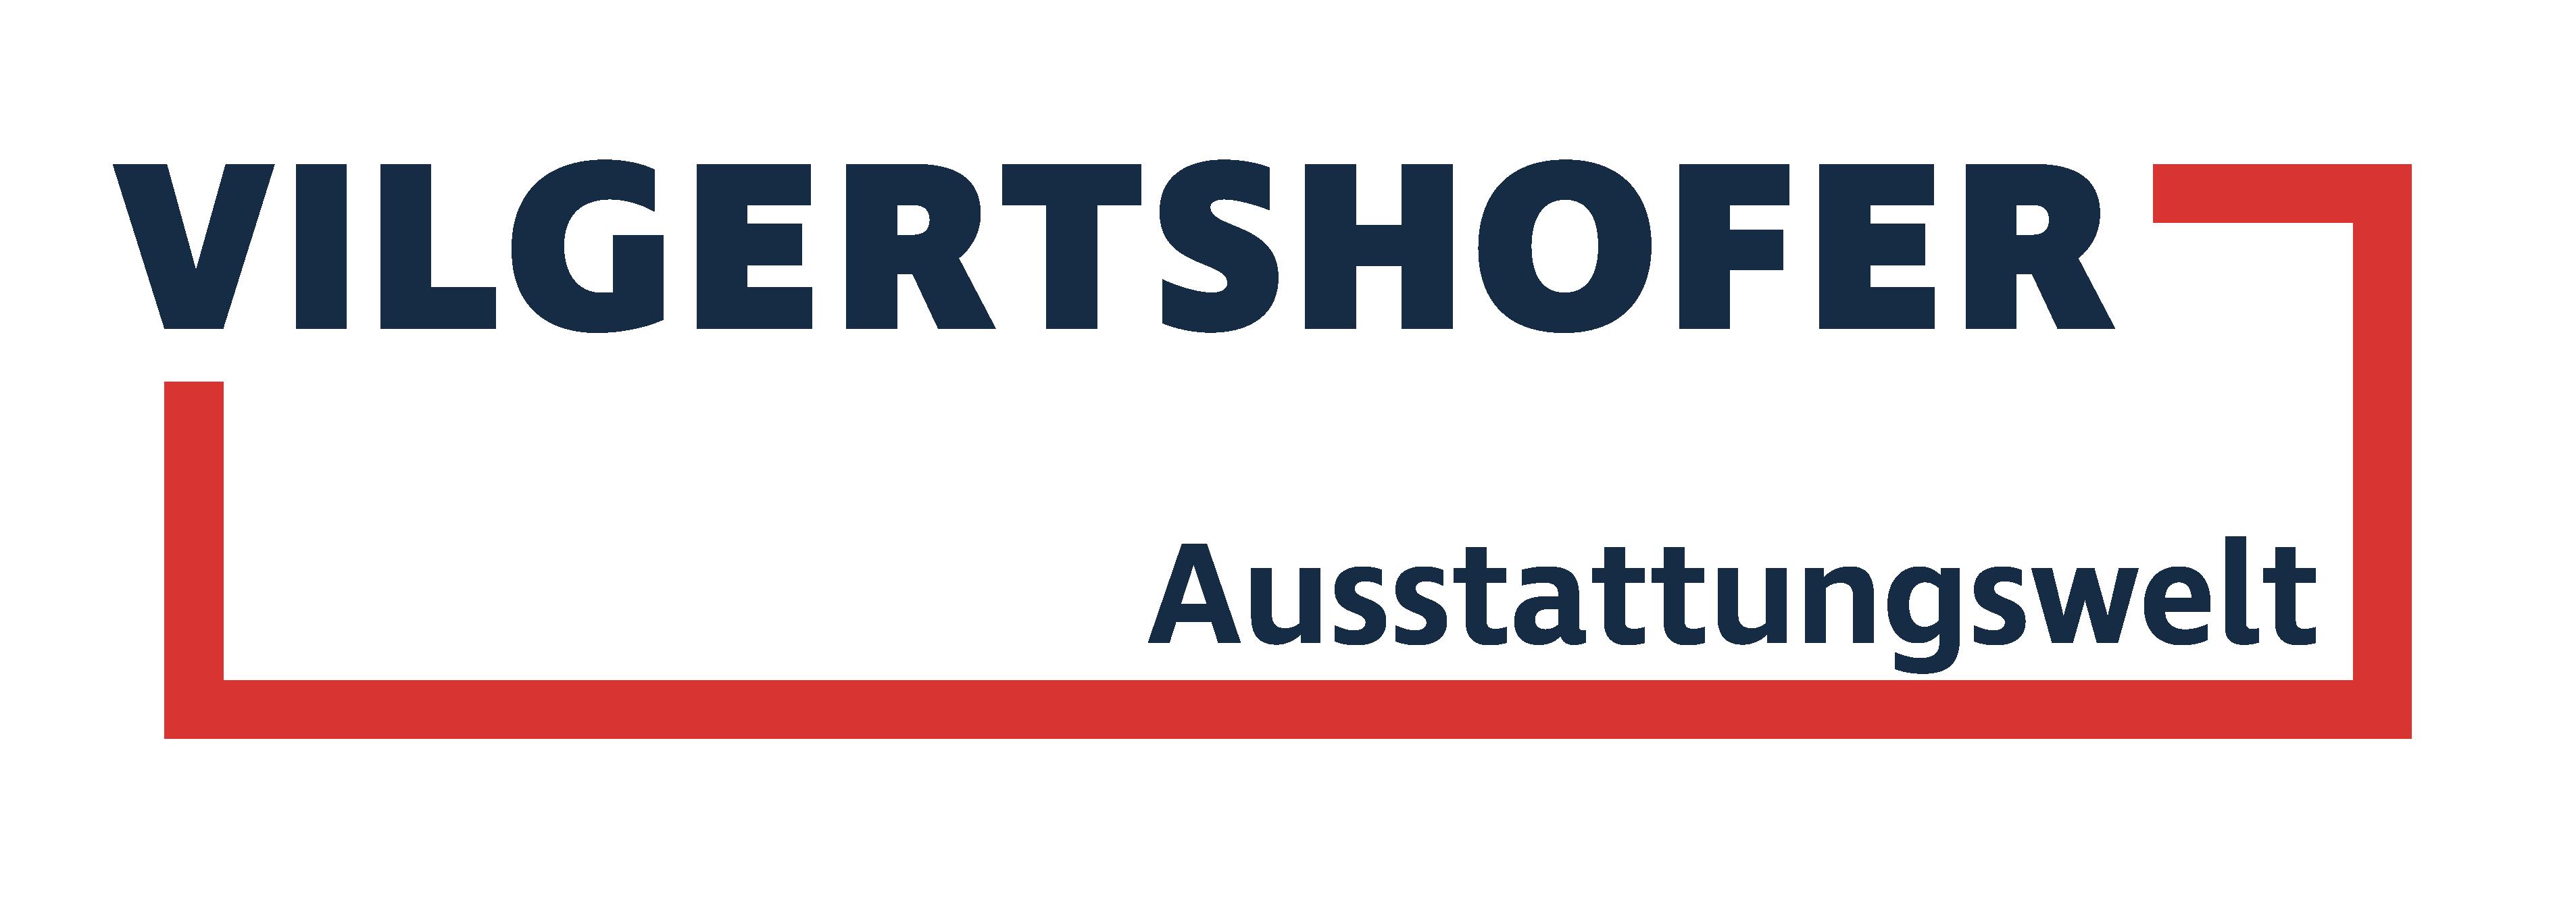 Vilgertshofer Austattungswelt Logo